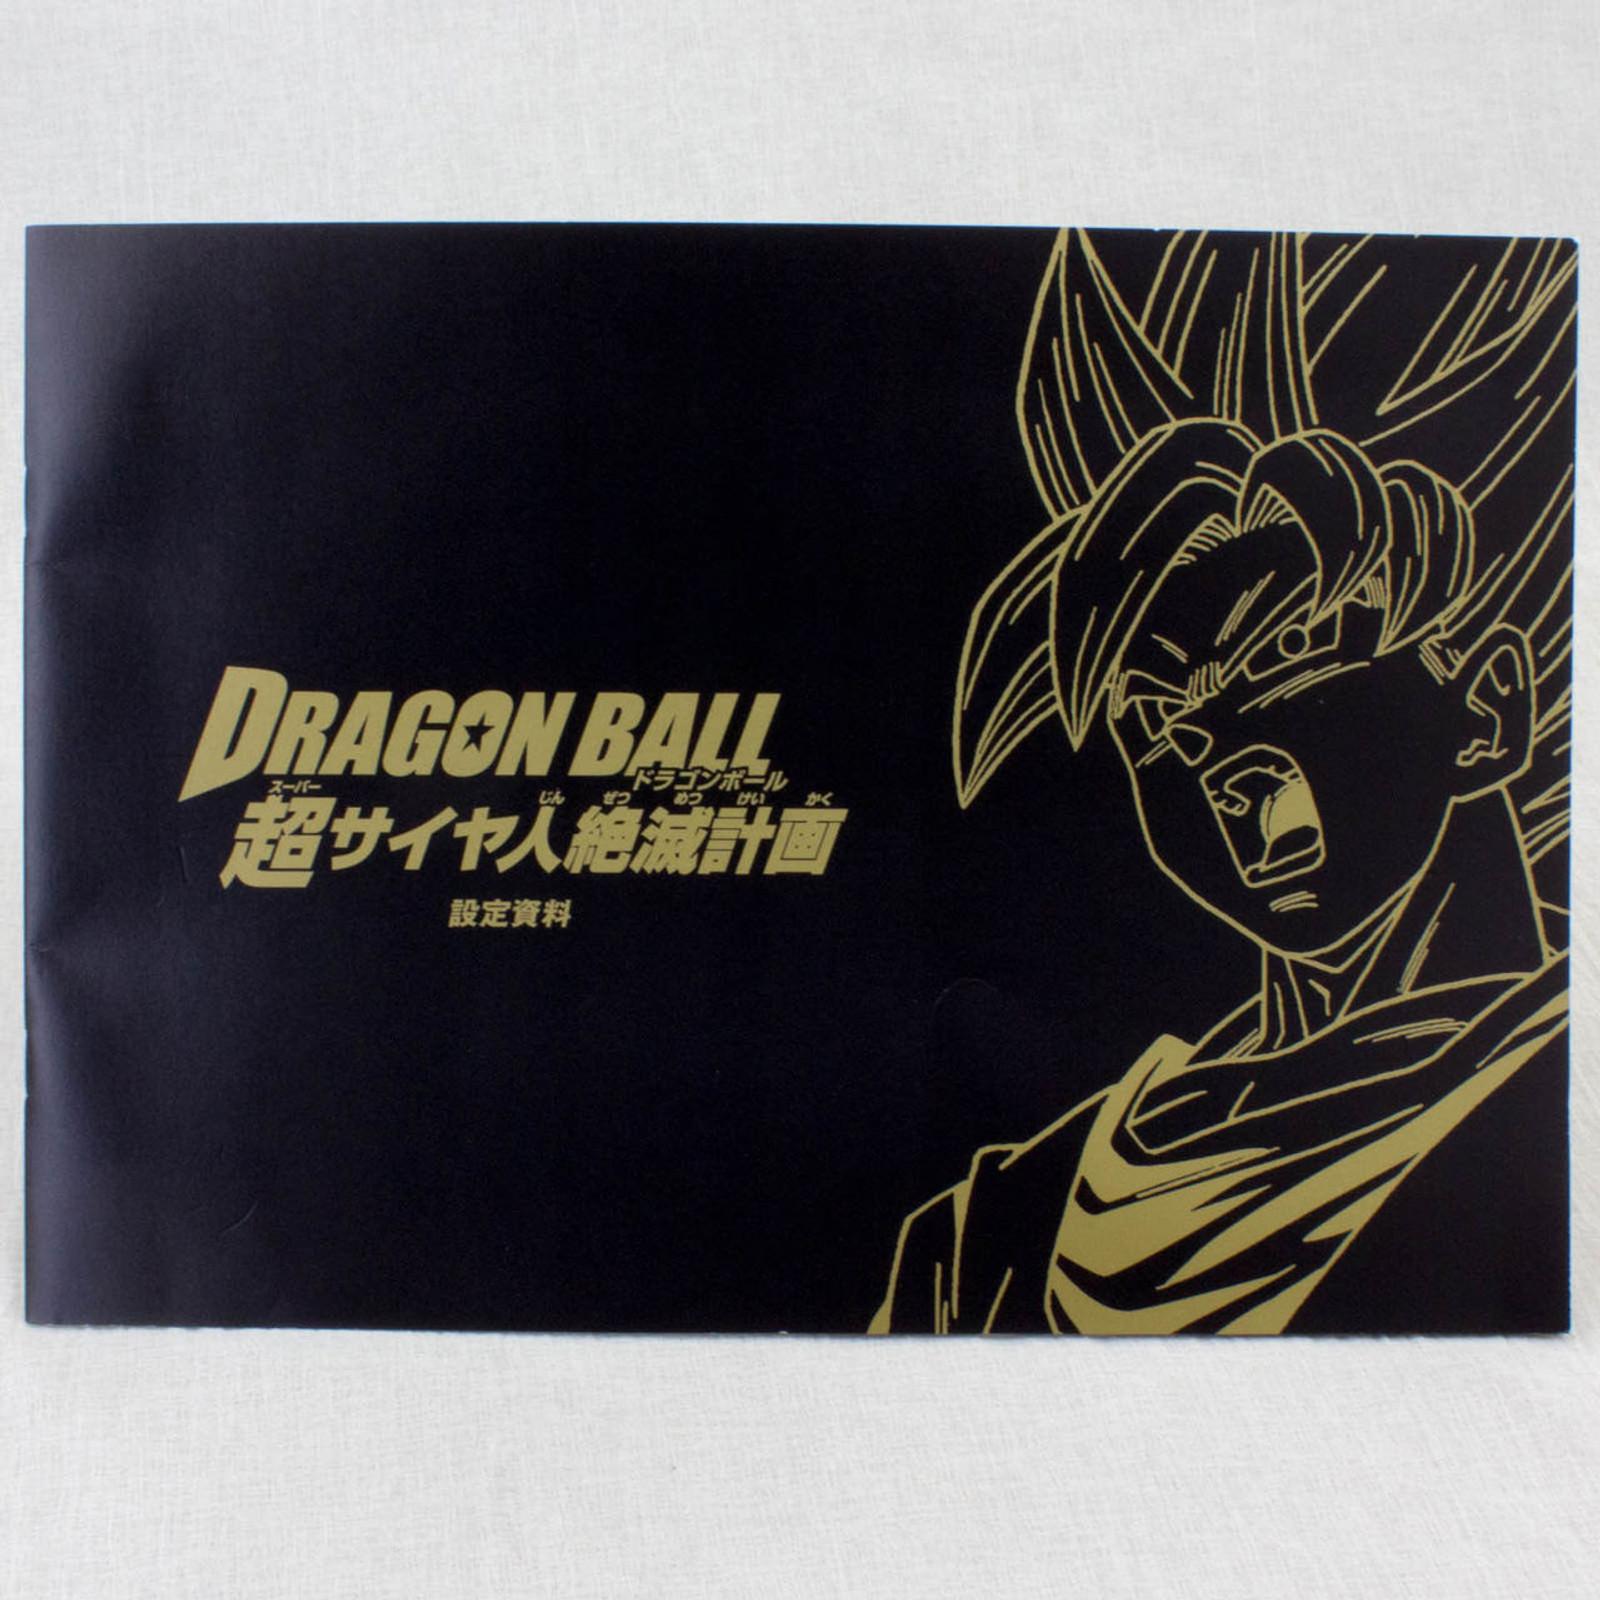 Dragon Ball Z Raging Blast 2 PS3 Game Art Material Booklet JAPAN ANIME MANGA